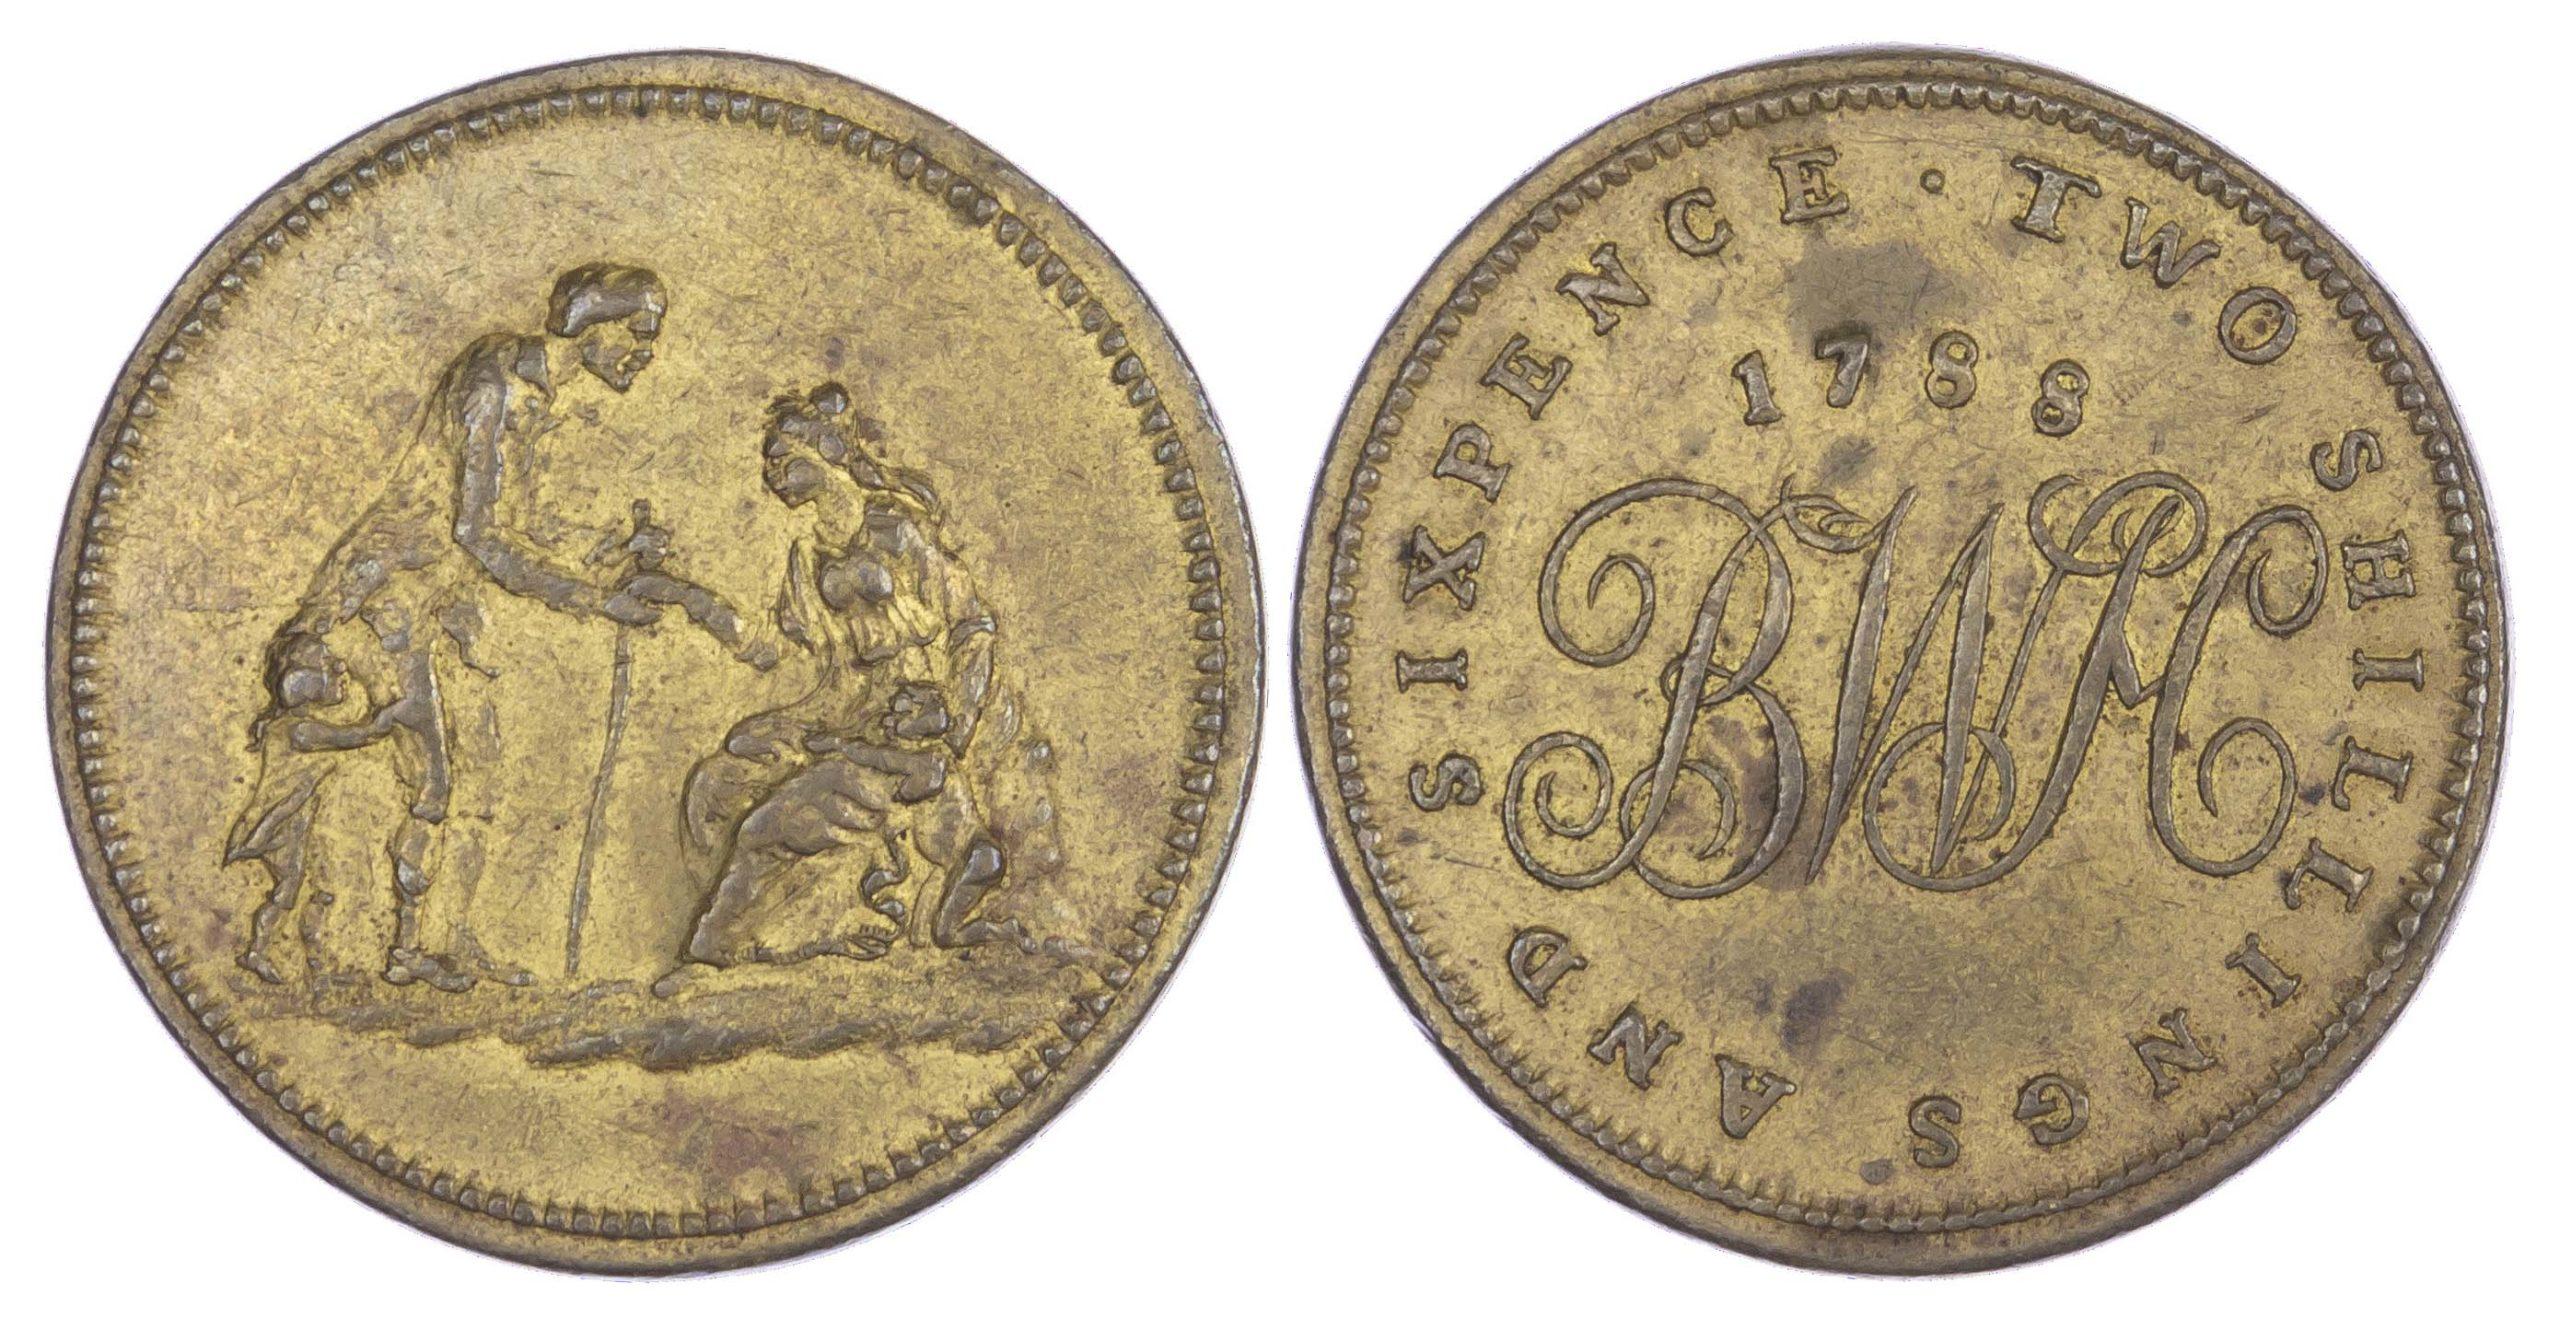 Warwickshire, BIRMINGHAM, Workhouse, Gimblett's brass Two Shillings and Sixpence, 1788